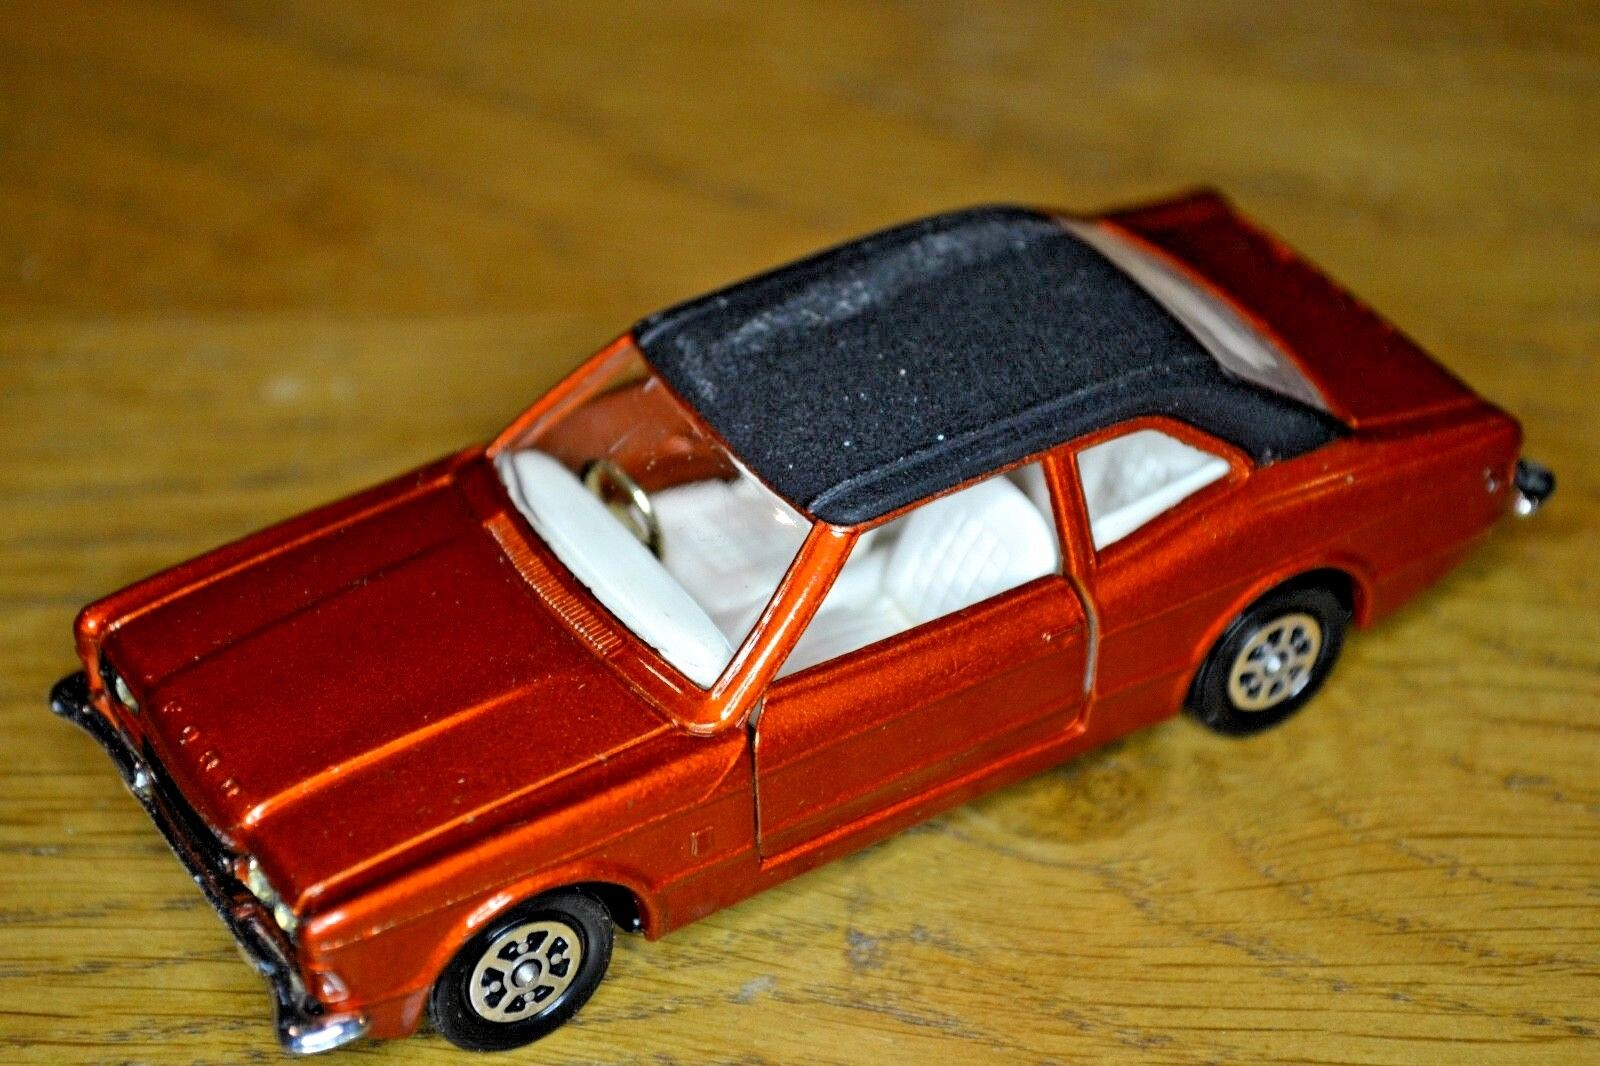 Vintage CORGI Nº Nº Nº 313 Ford Cortina GXL; Original Graham Hill Box | Insolite  | à La Mode  | Porter-résistance  415dad